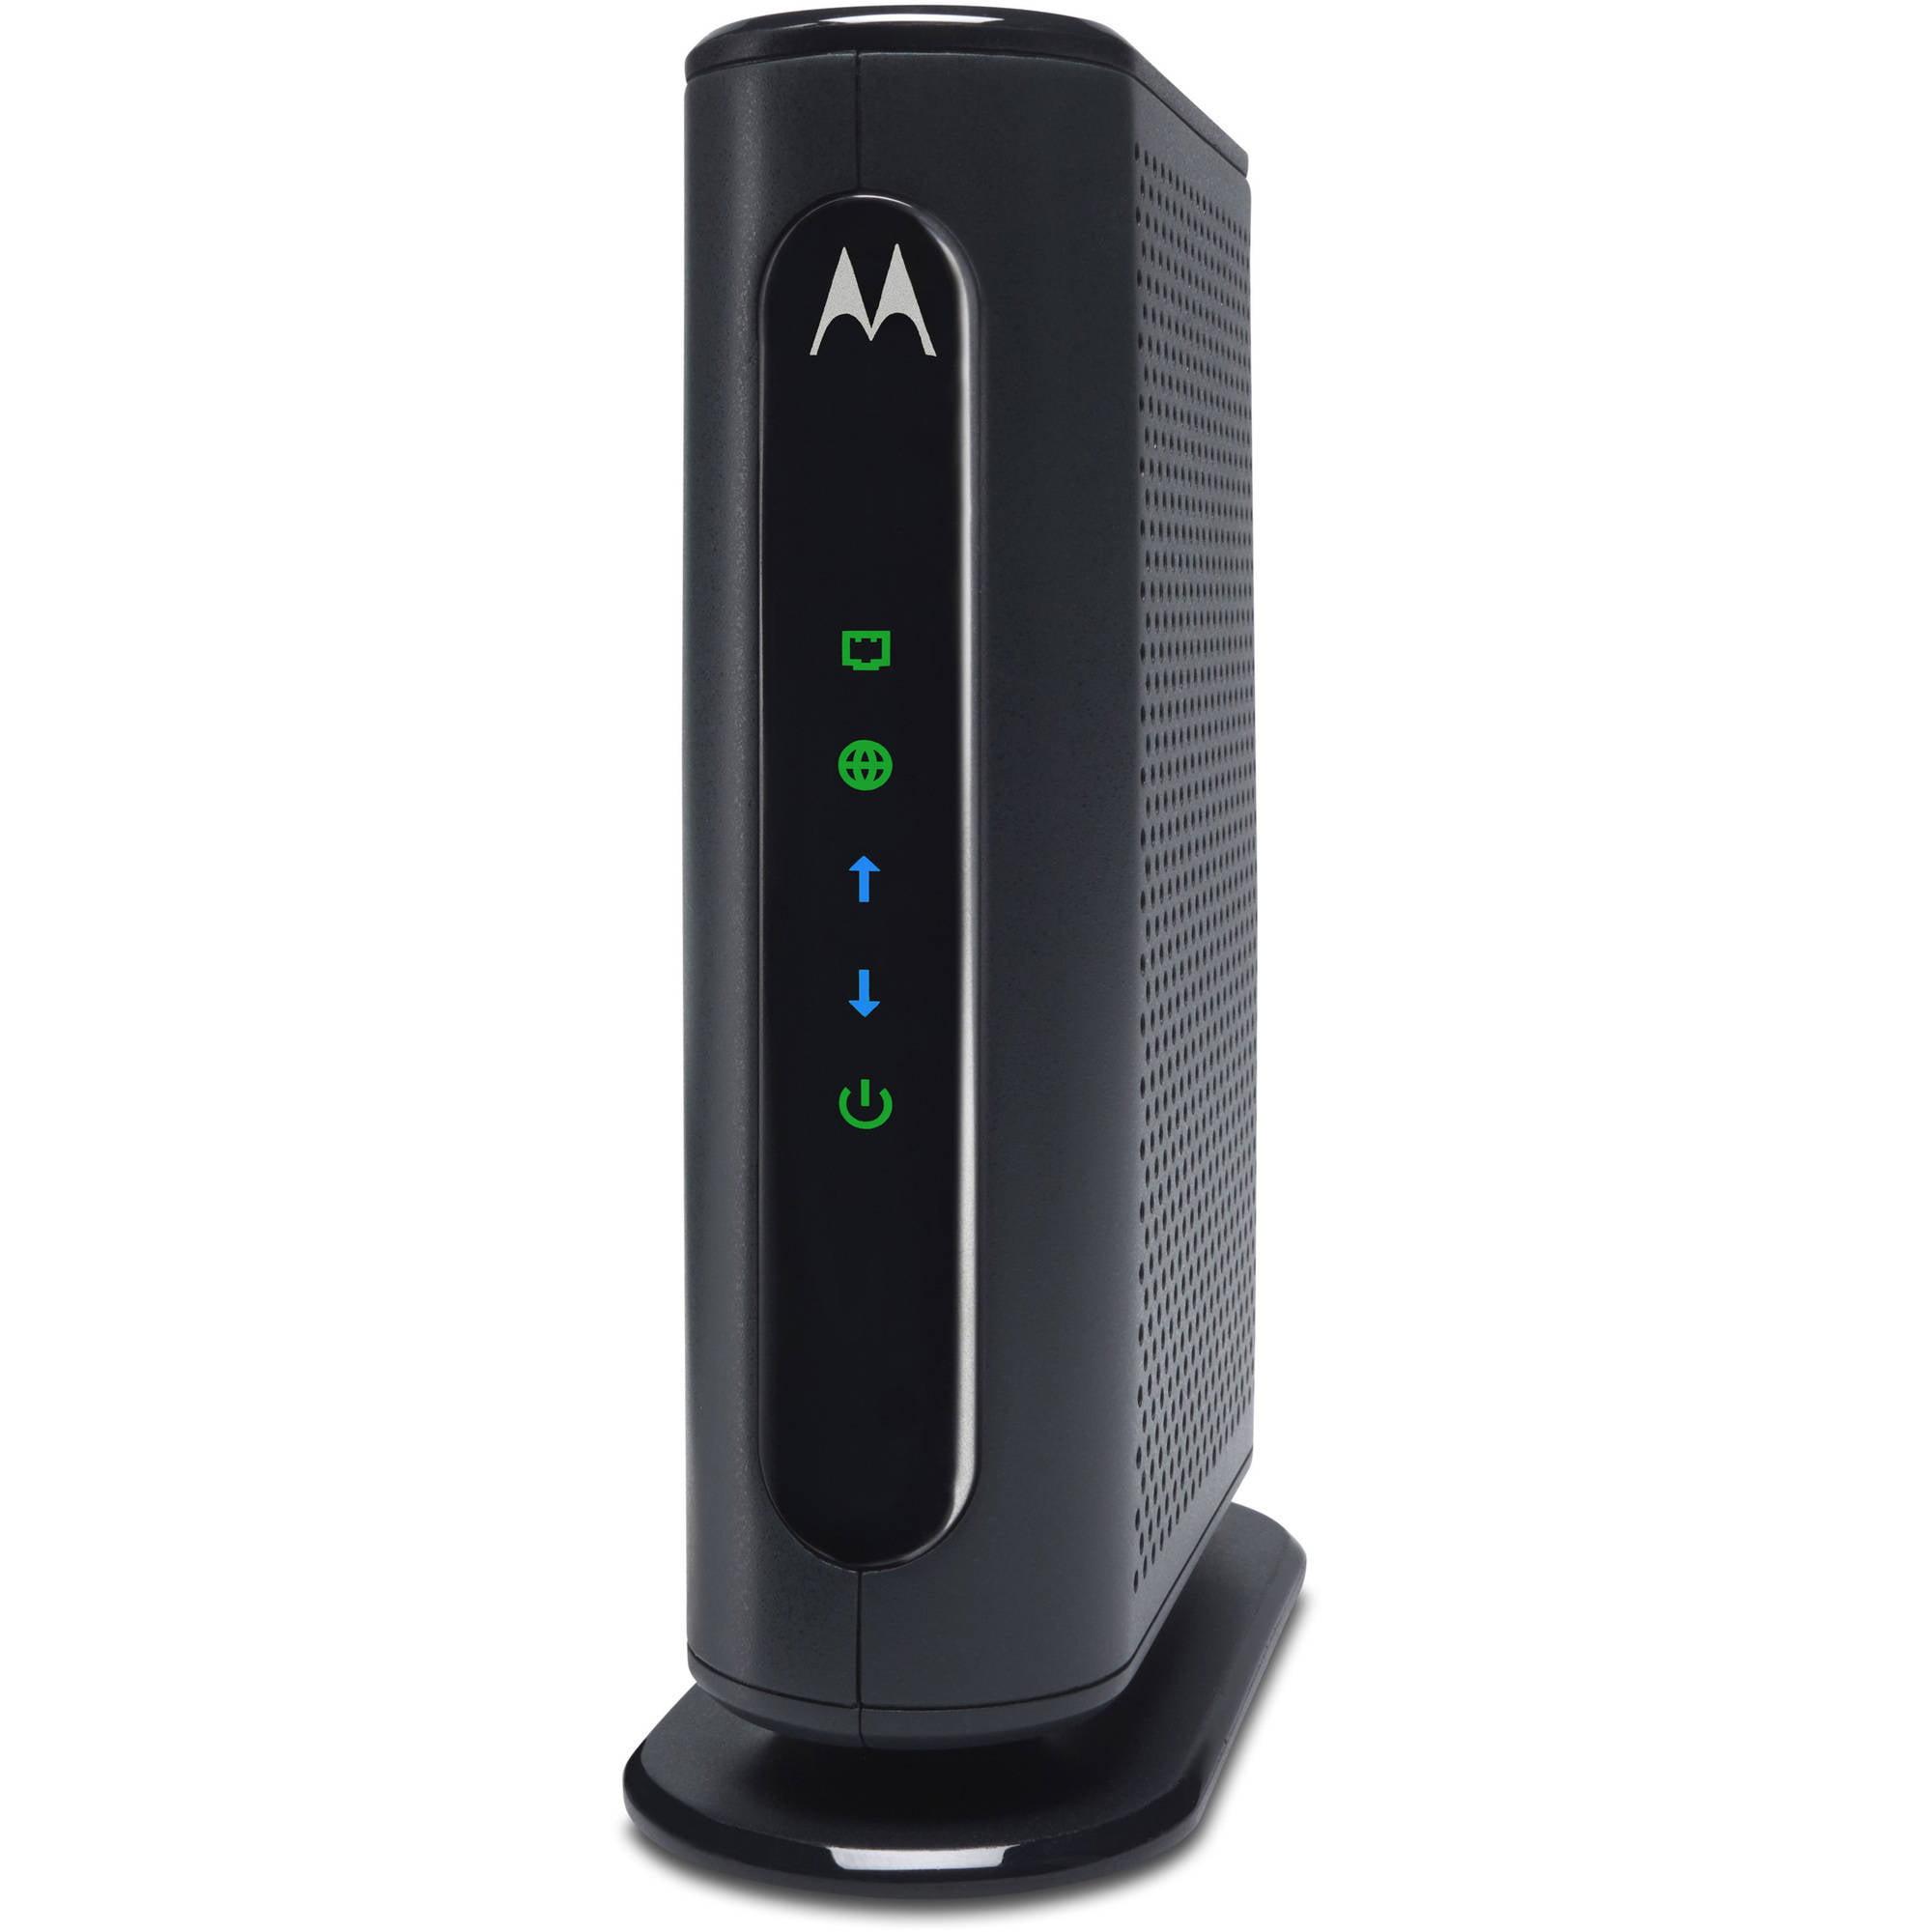 motorola mb7220 modem - walmart